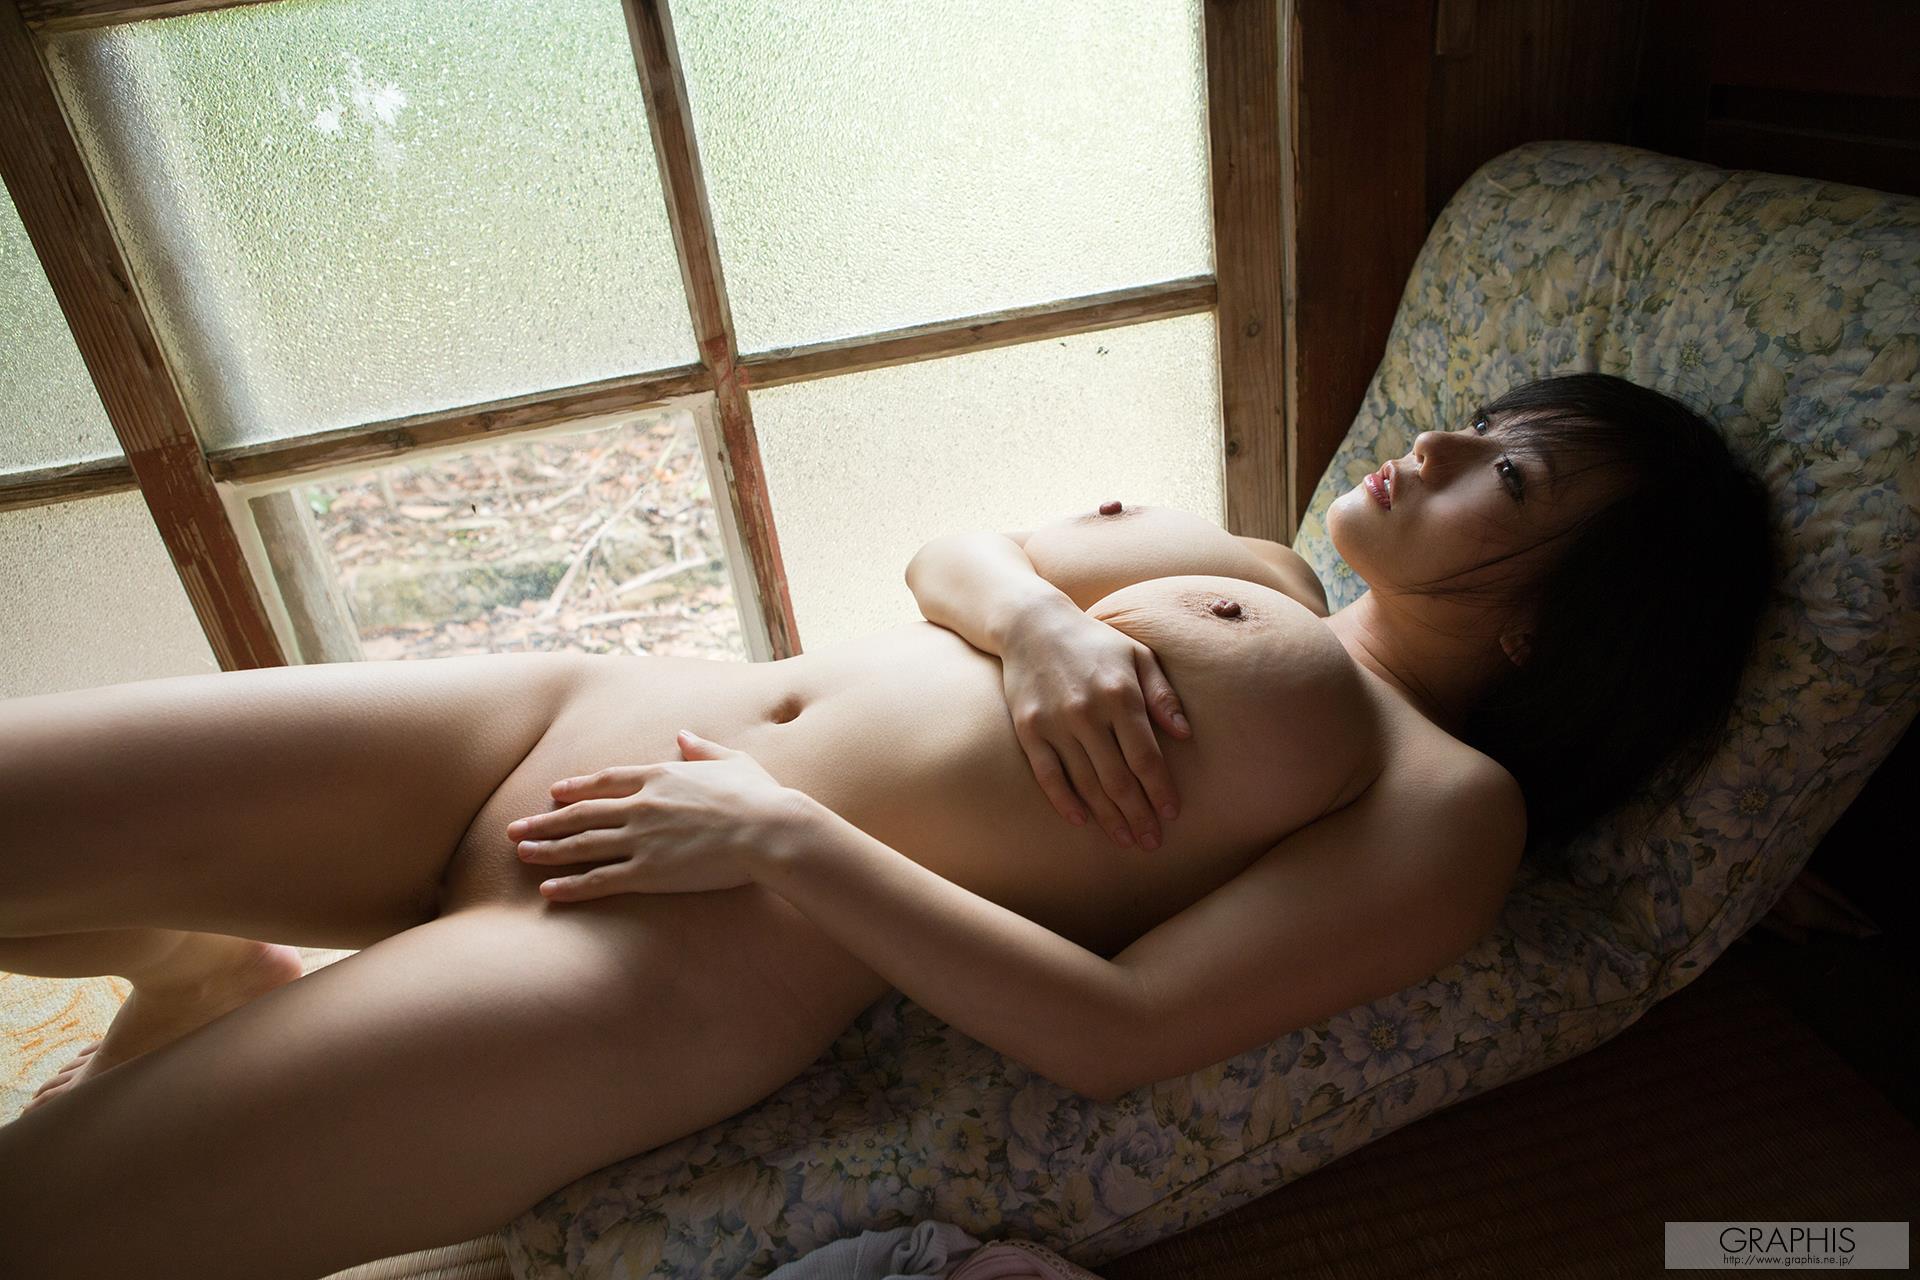 gra_kaho-s080.jpg